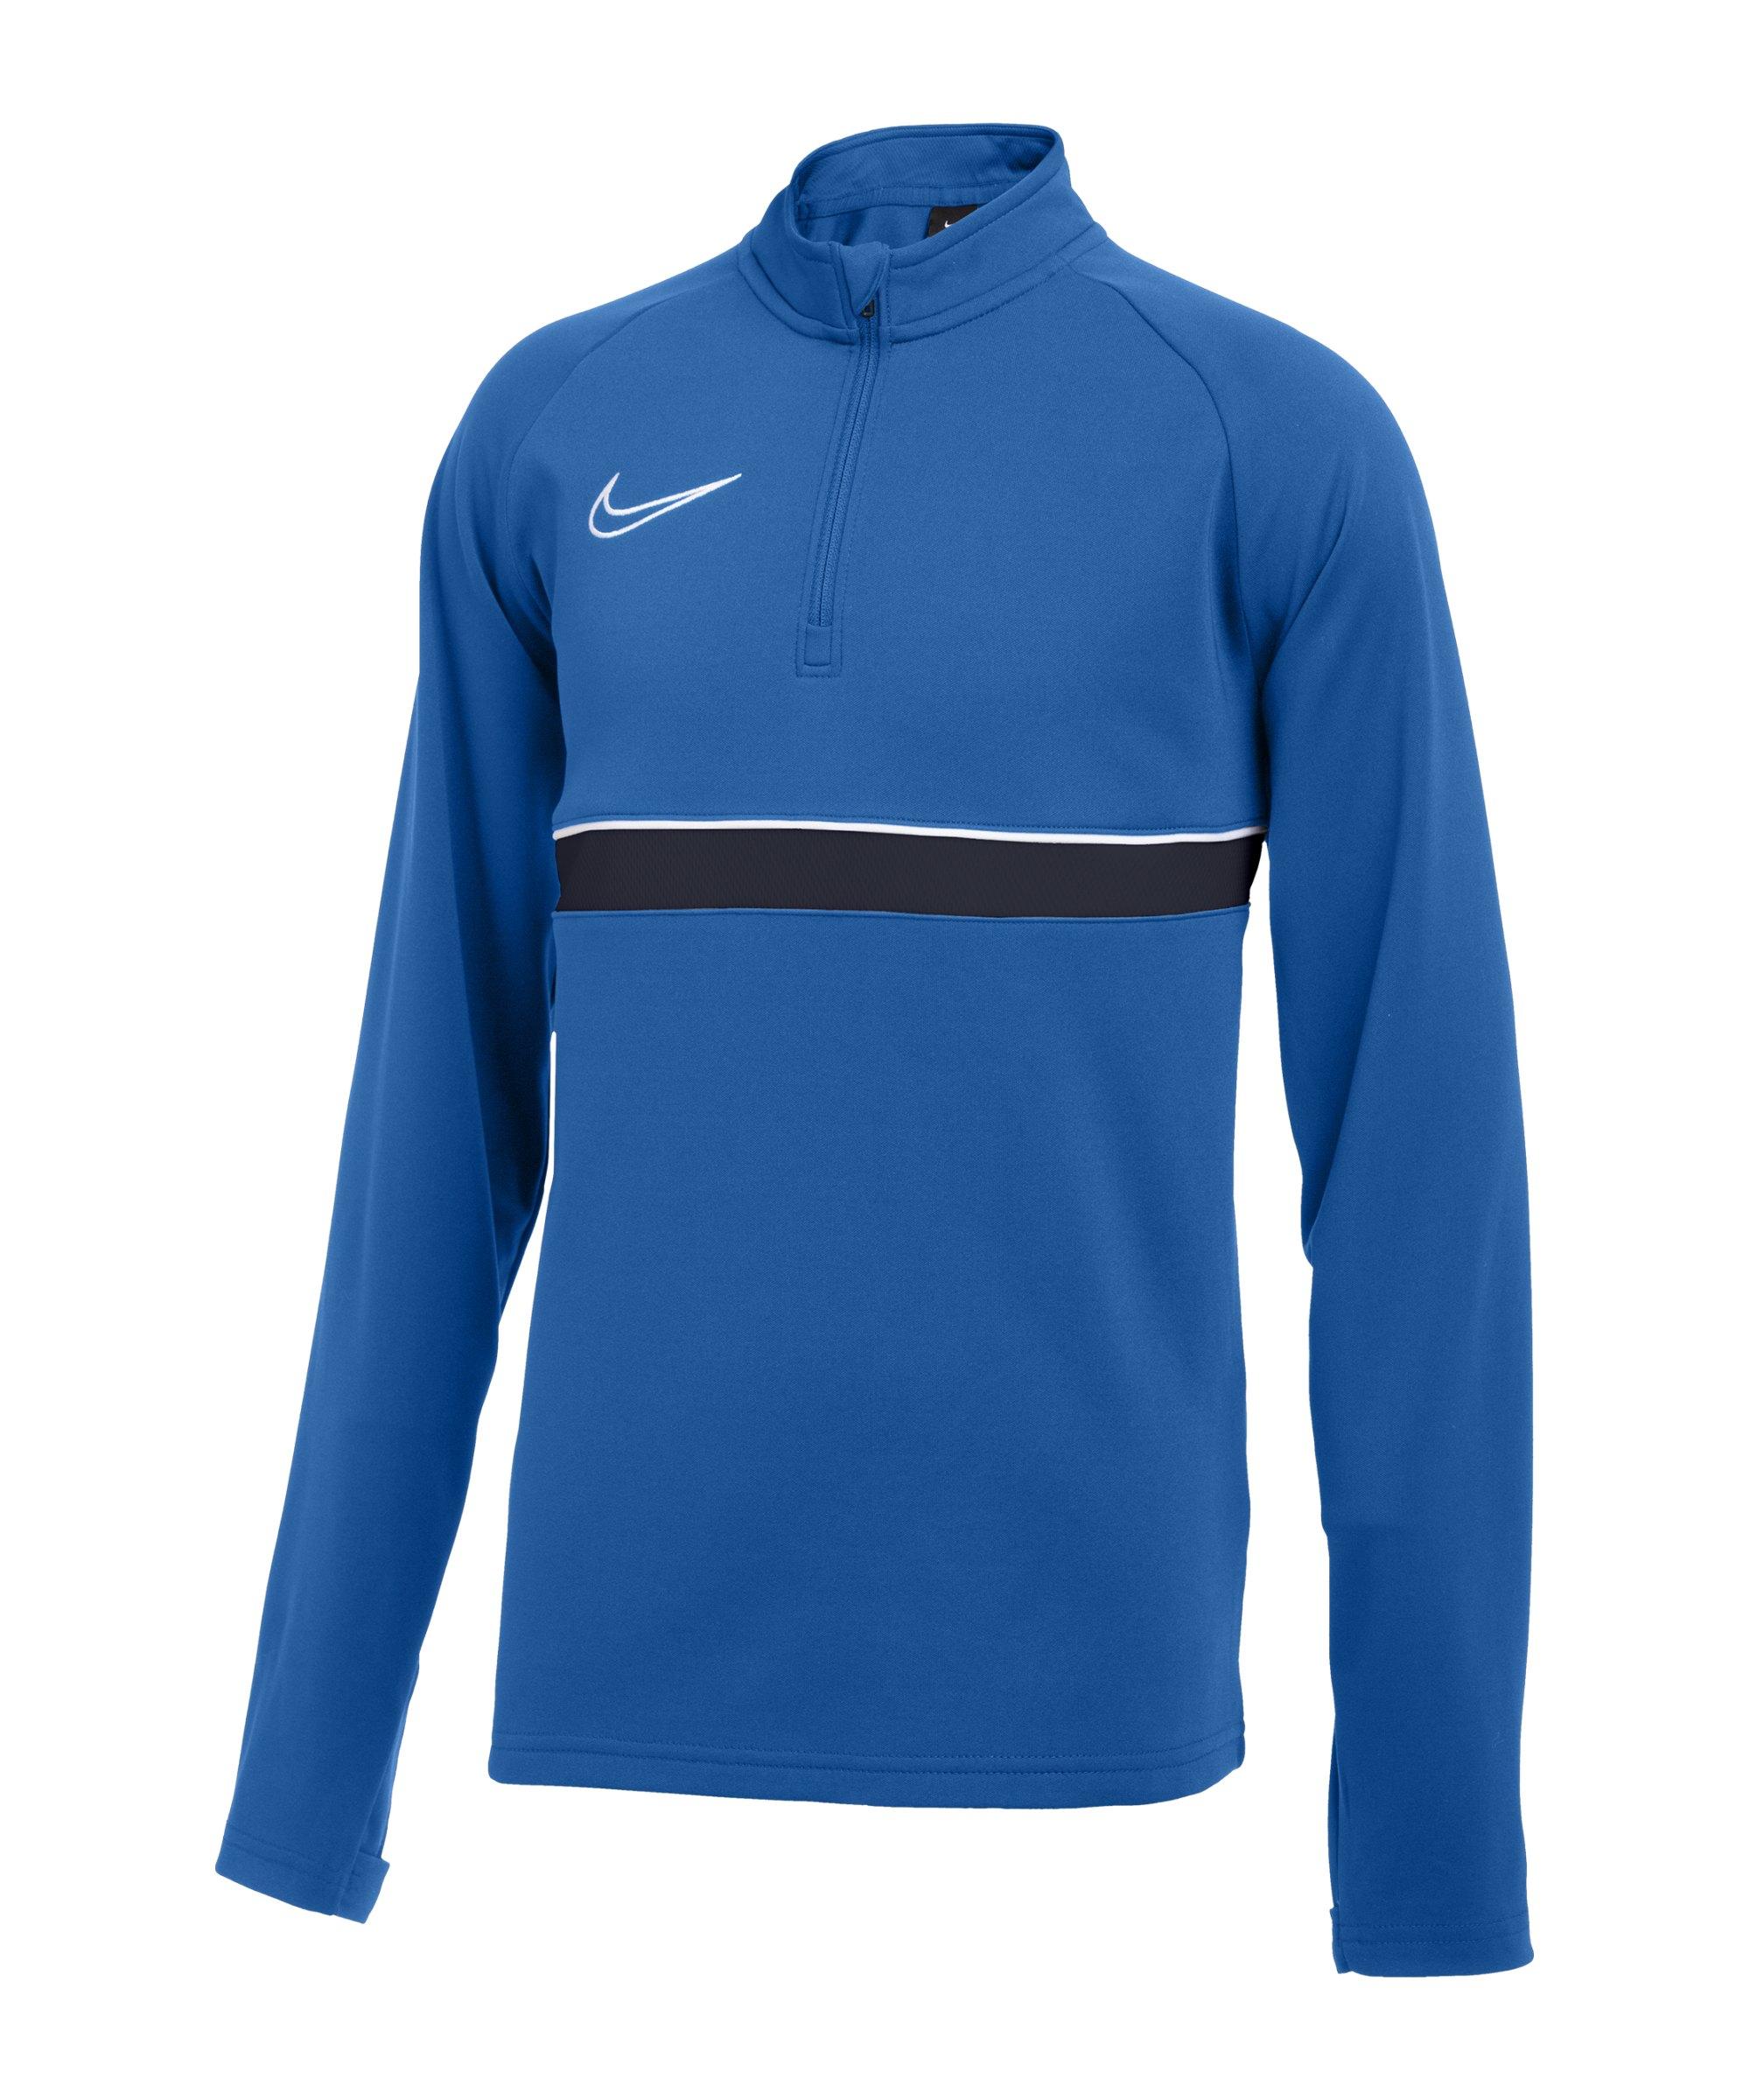 Nike Academy 21 Drill Top Kids Blau Weiss F463 - blau